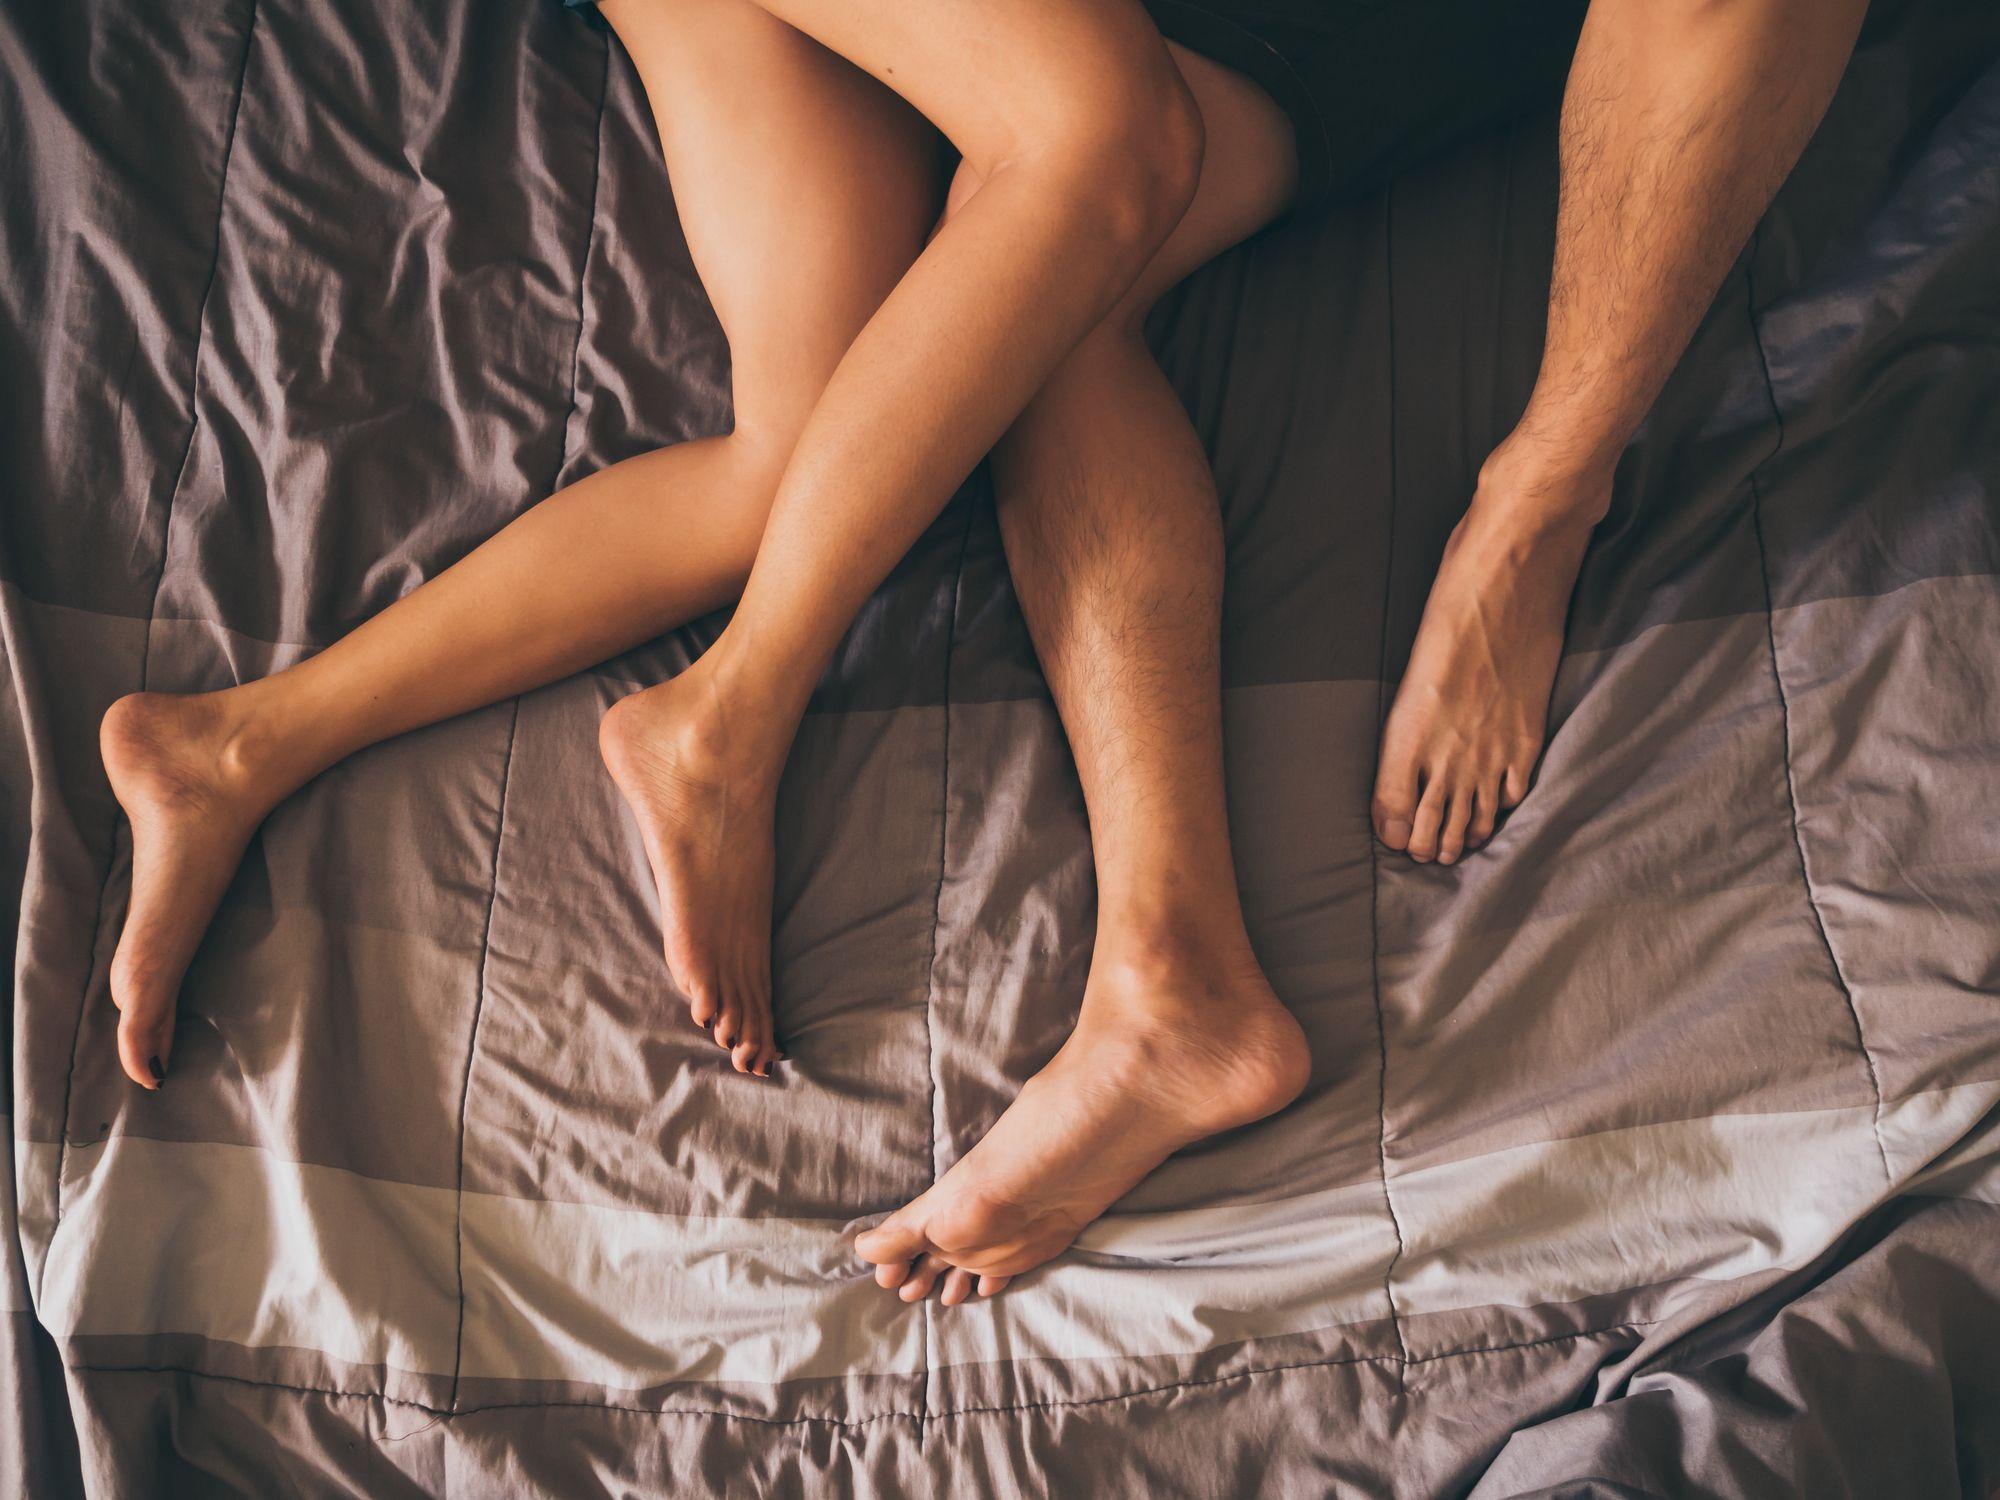 couple sex years